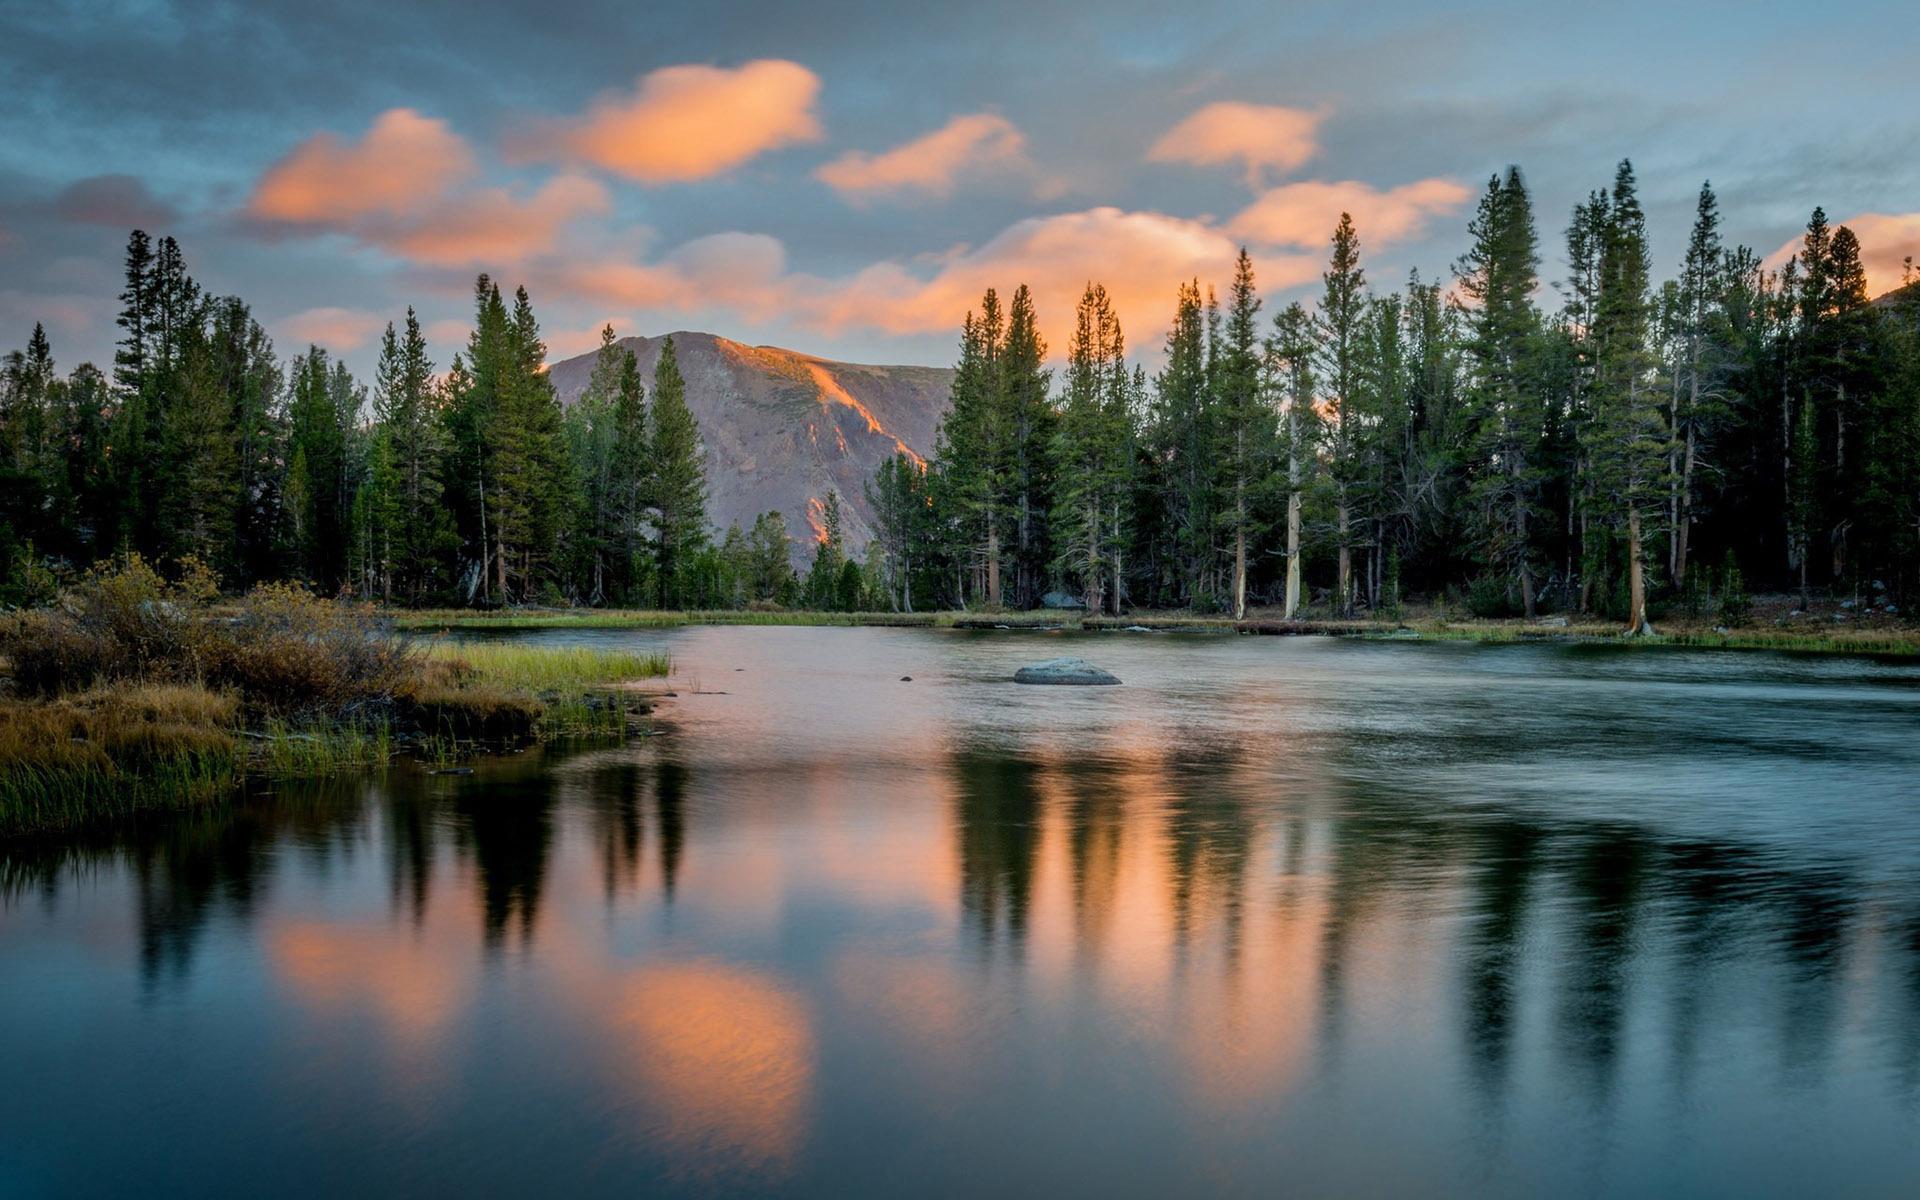 Baby Girl Hd Wallpaper Download Calm Lake After The Sunset Hd Desktop Wallpaper